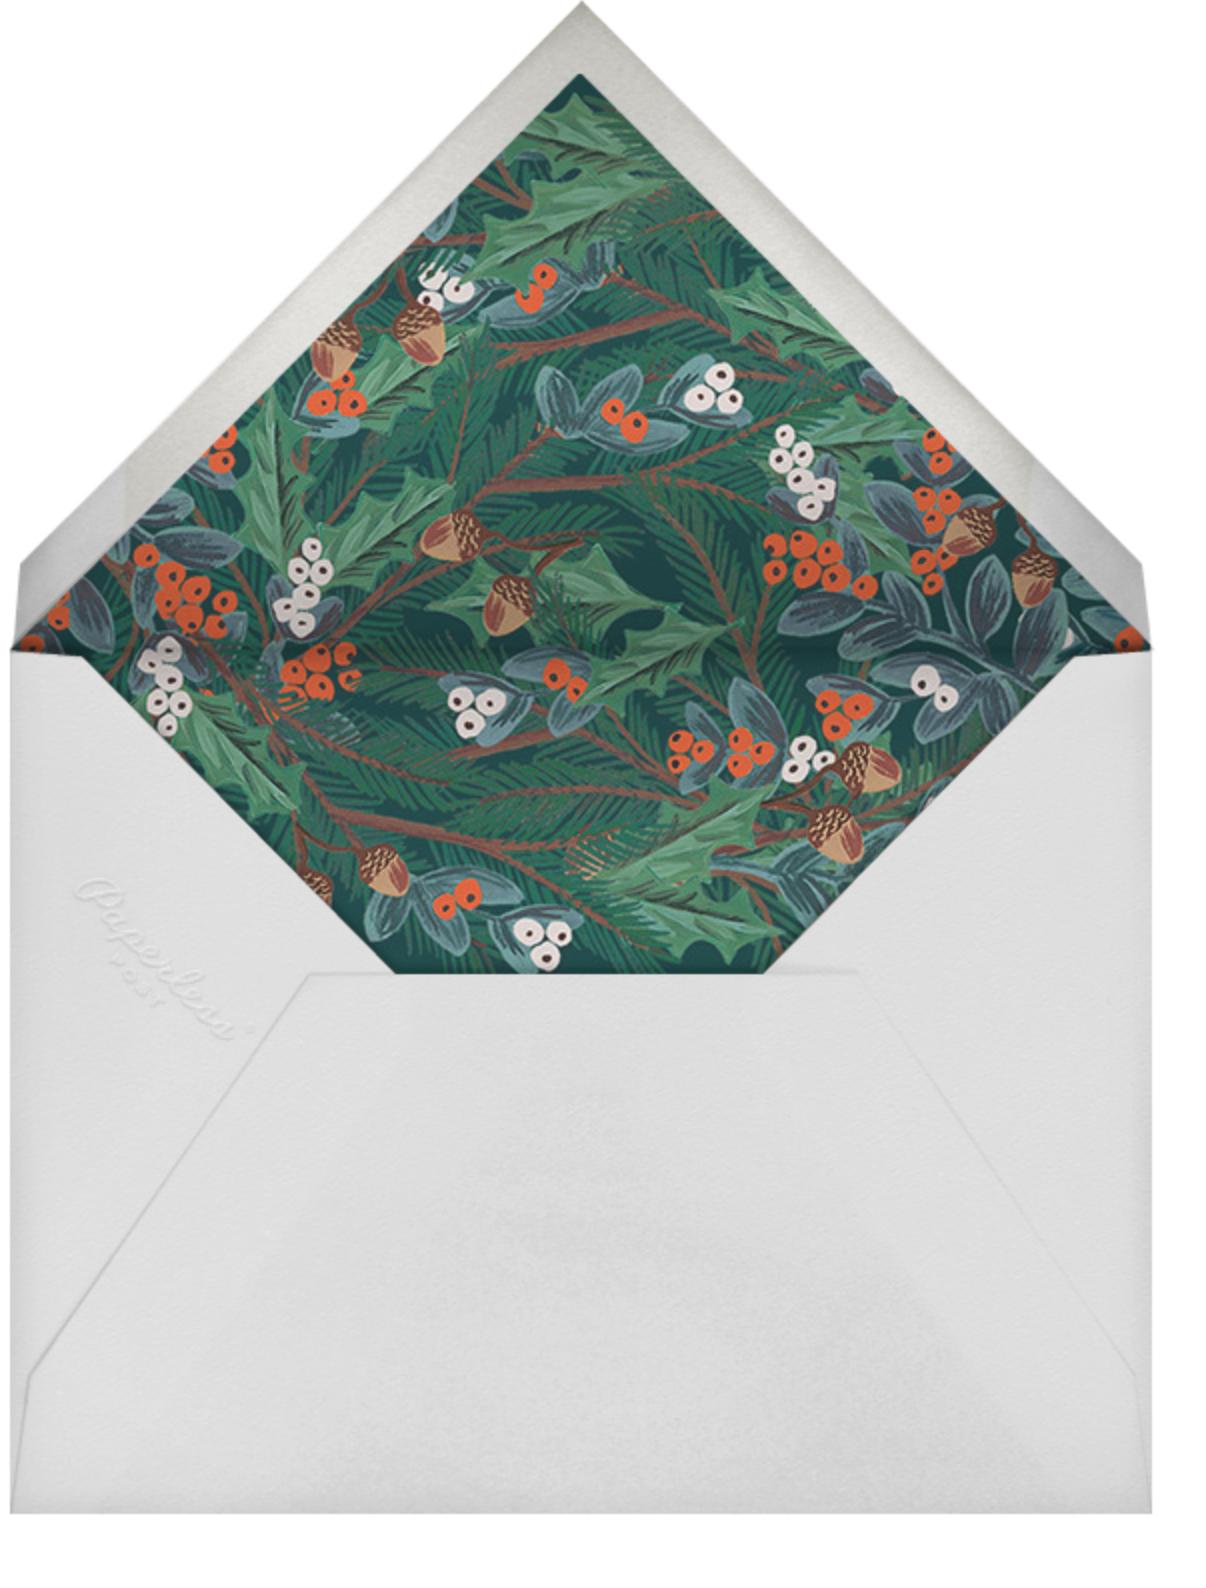 Winter Foliage (Invitation) - Rifle Paper Co. - Winter Favorites - envelope back